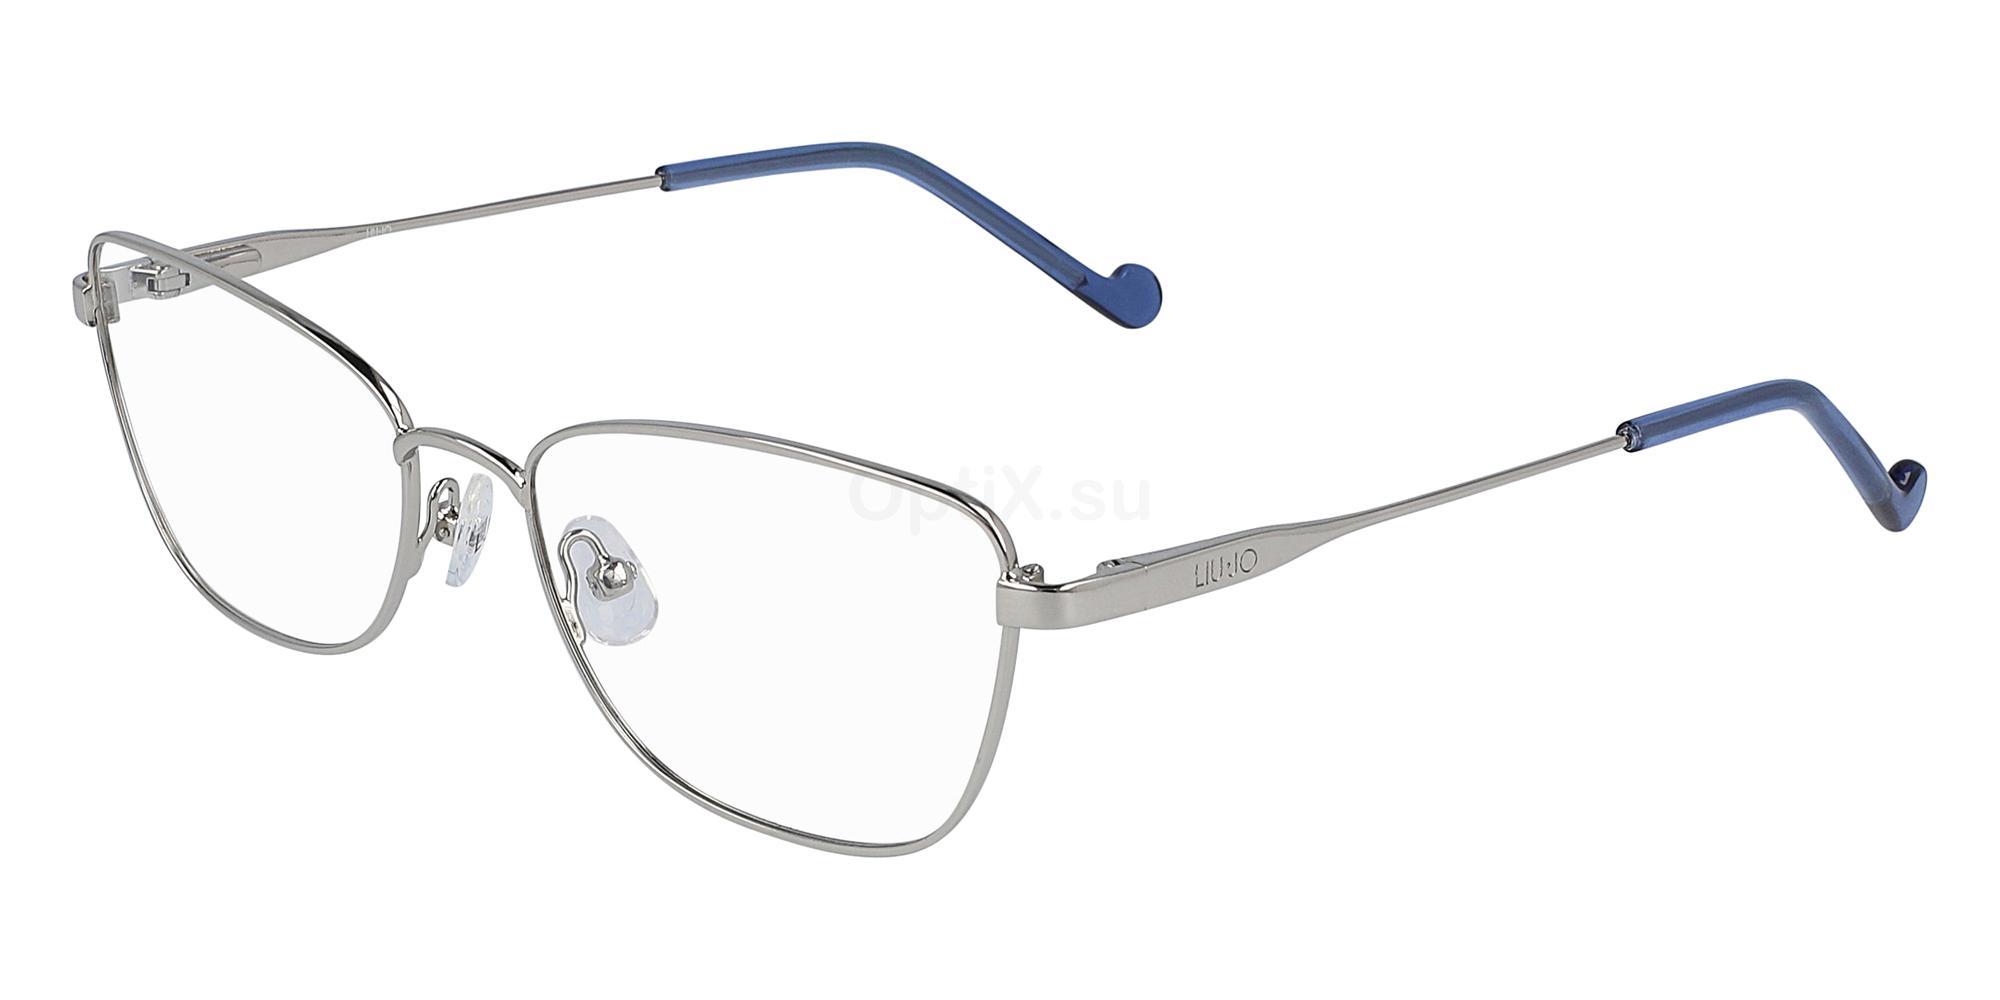 043 LJ2142 Glasses, Liu Jo